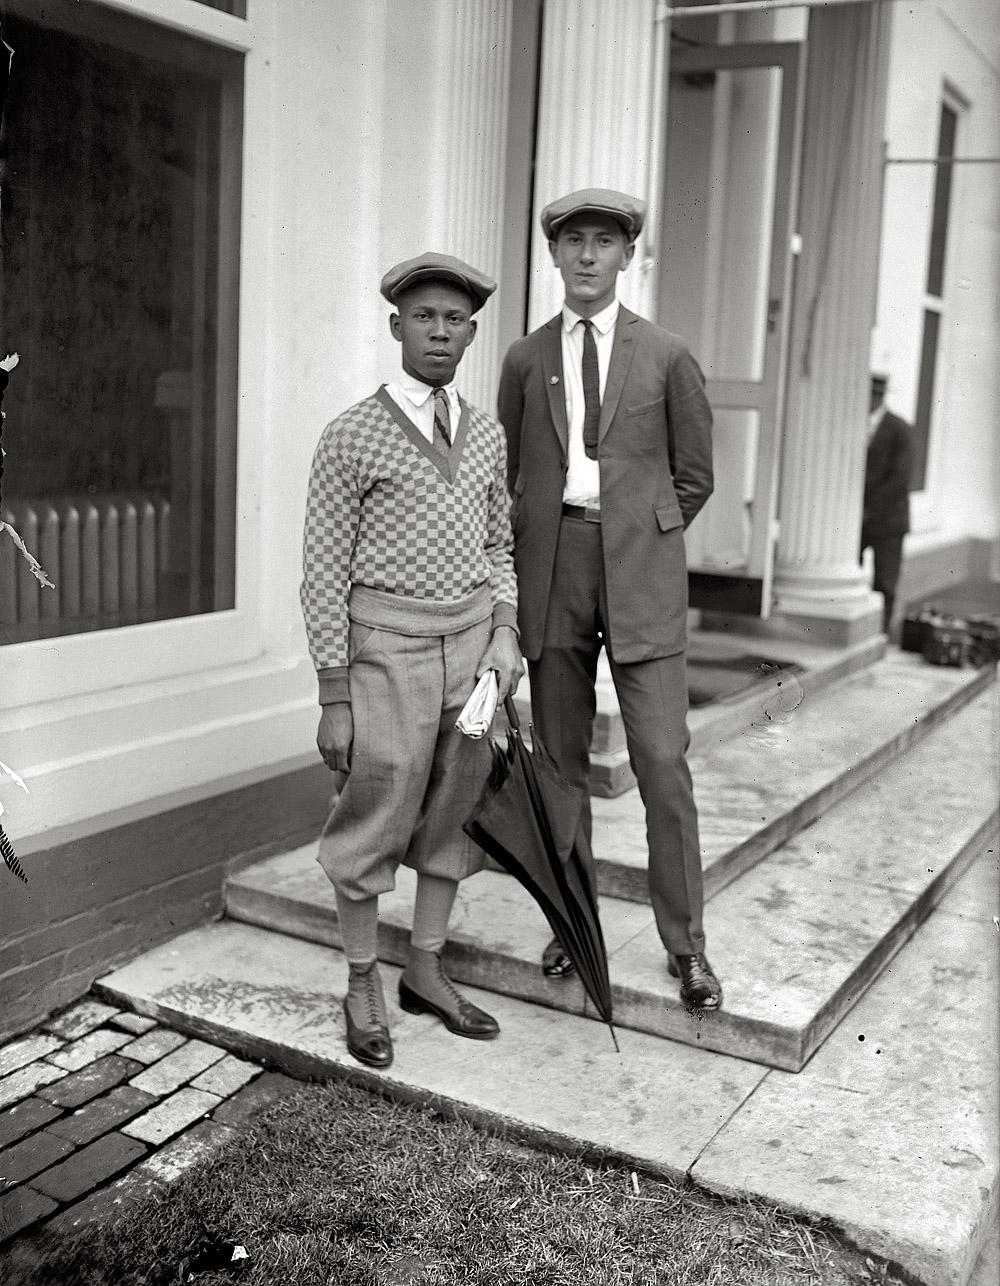 1920s Men S Fashion: 1920's Men's Fashion